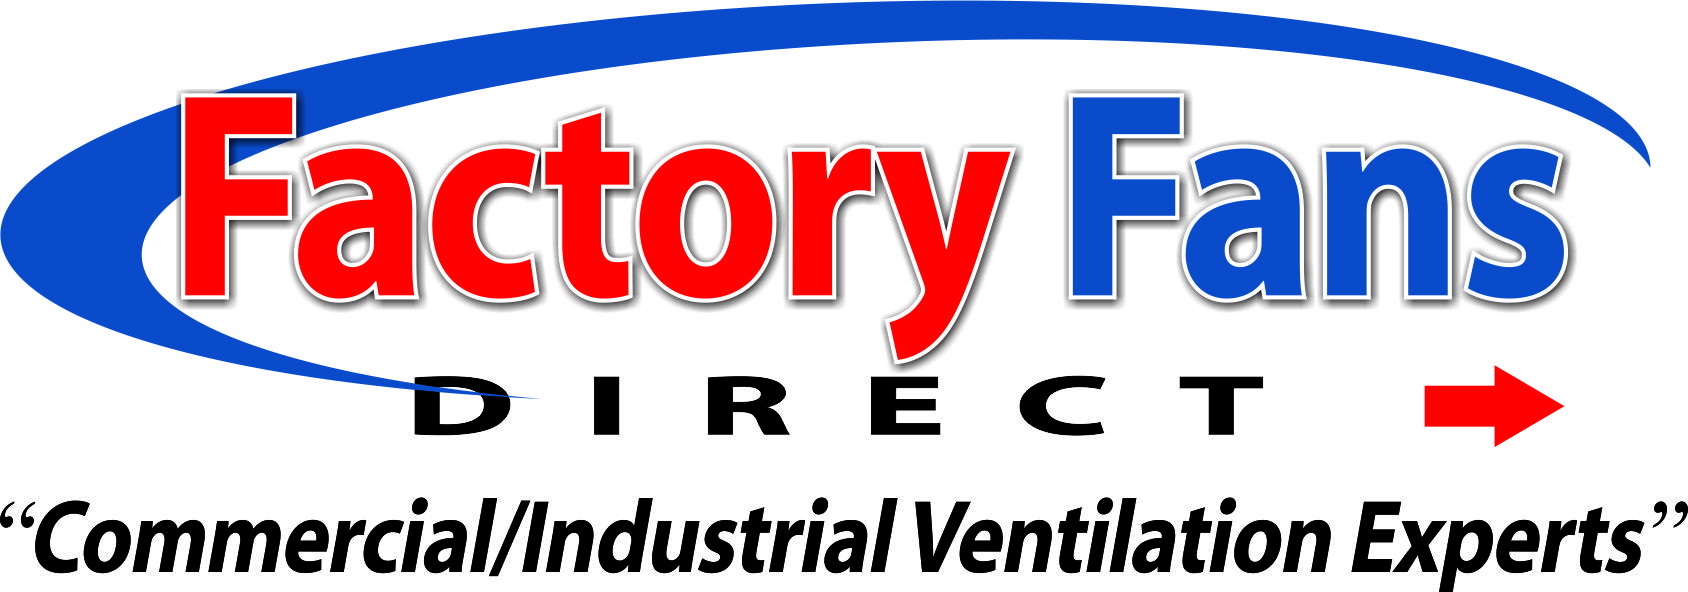 factory-fans-logo-commercial.jpg